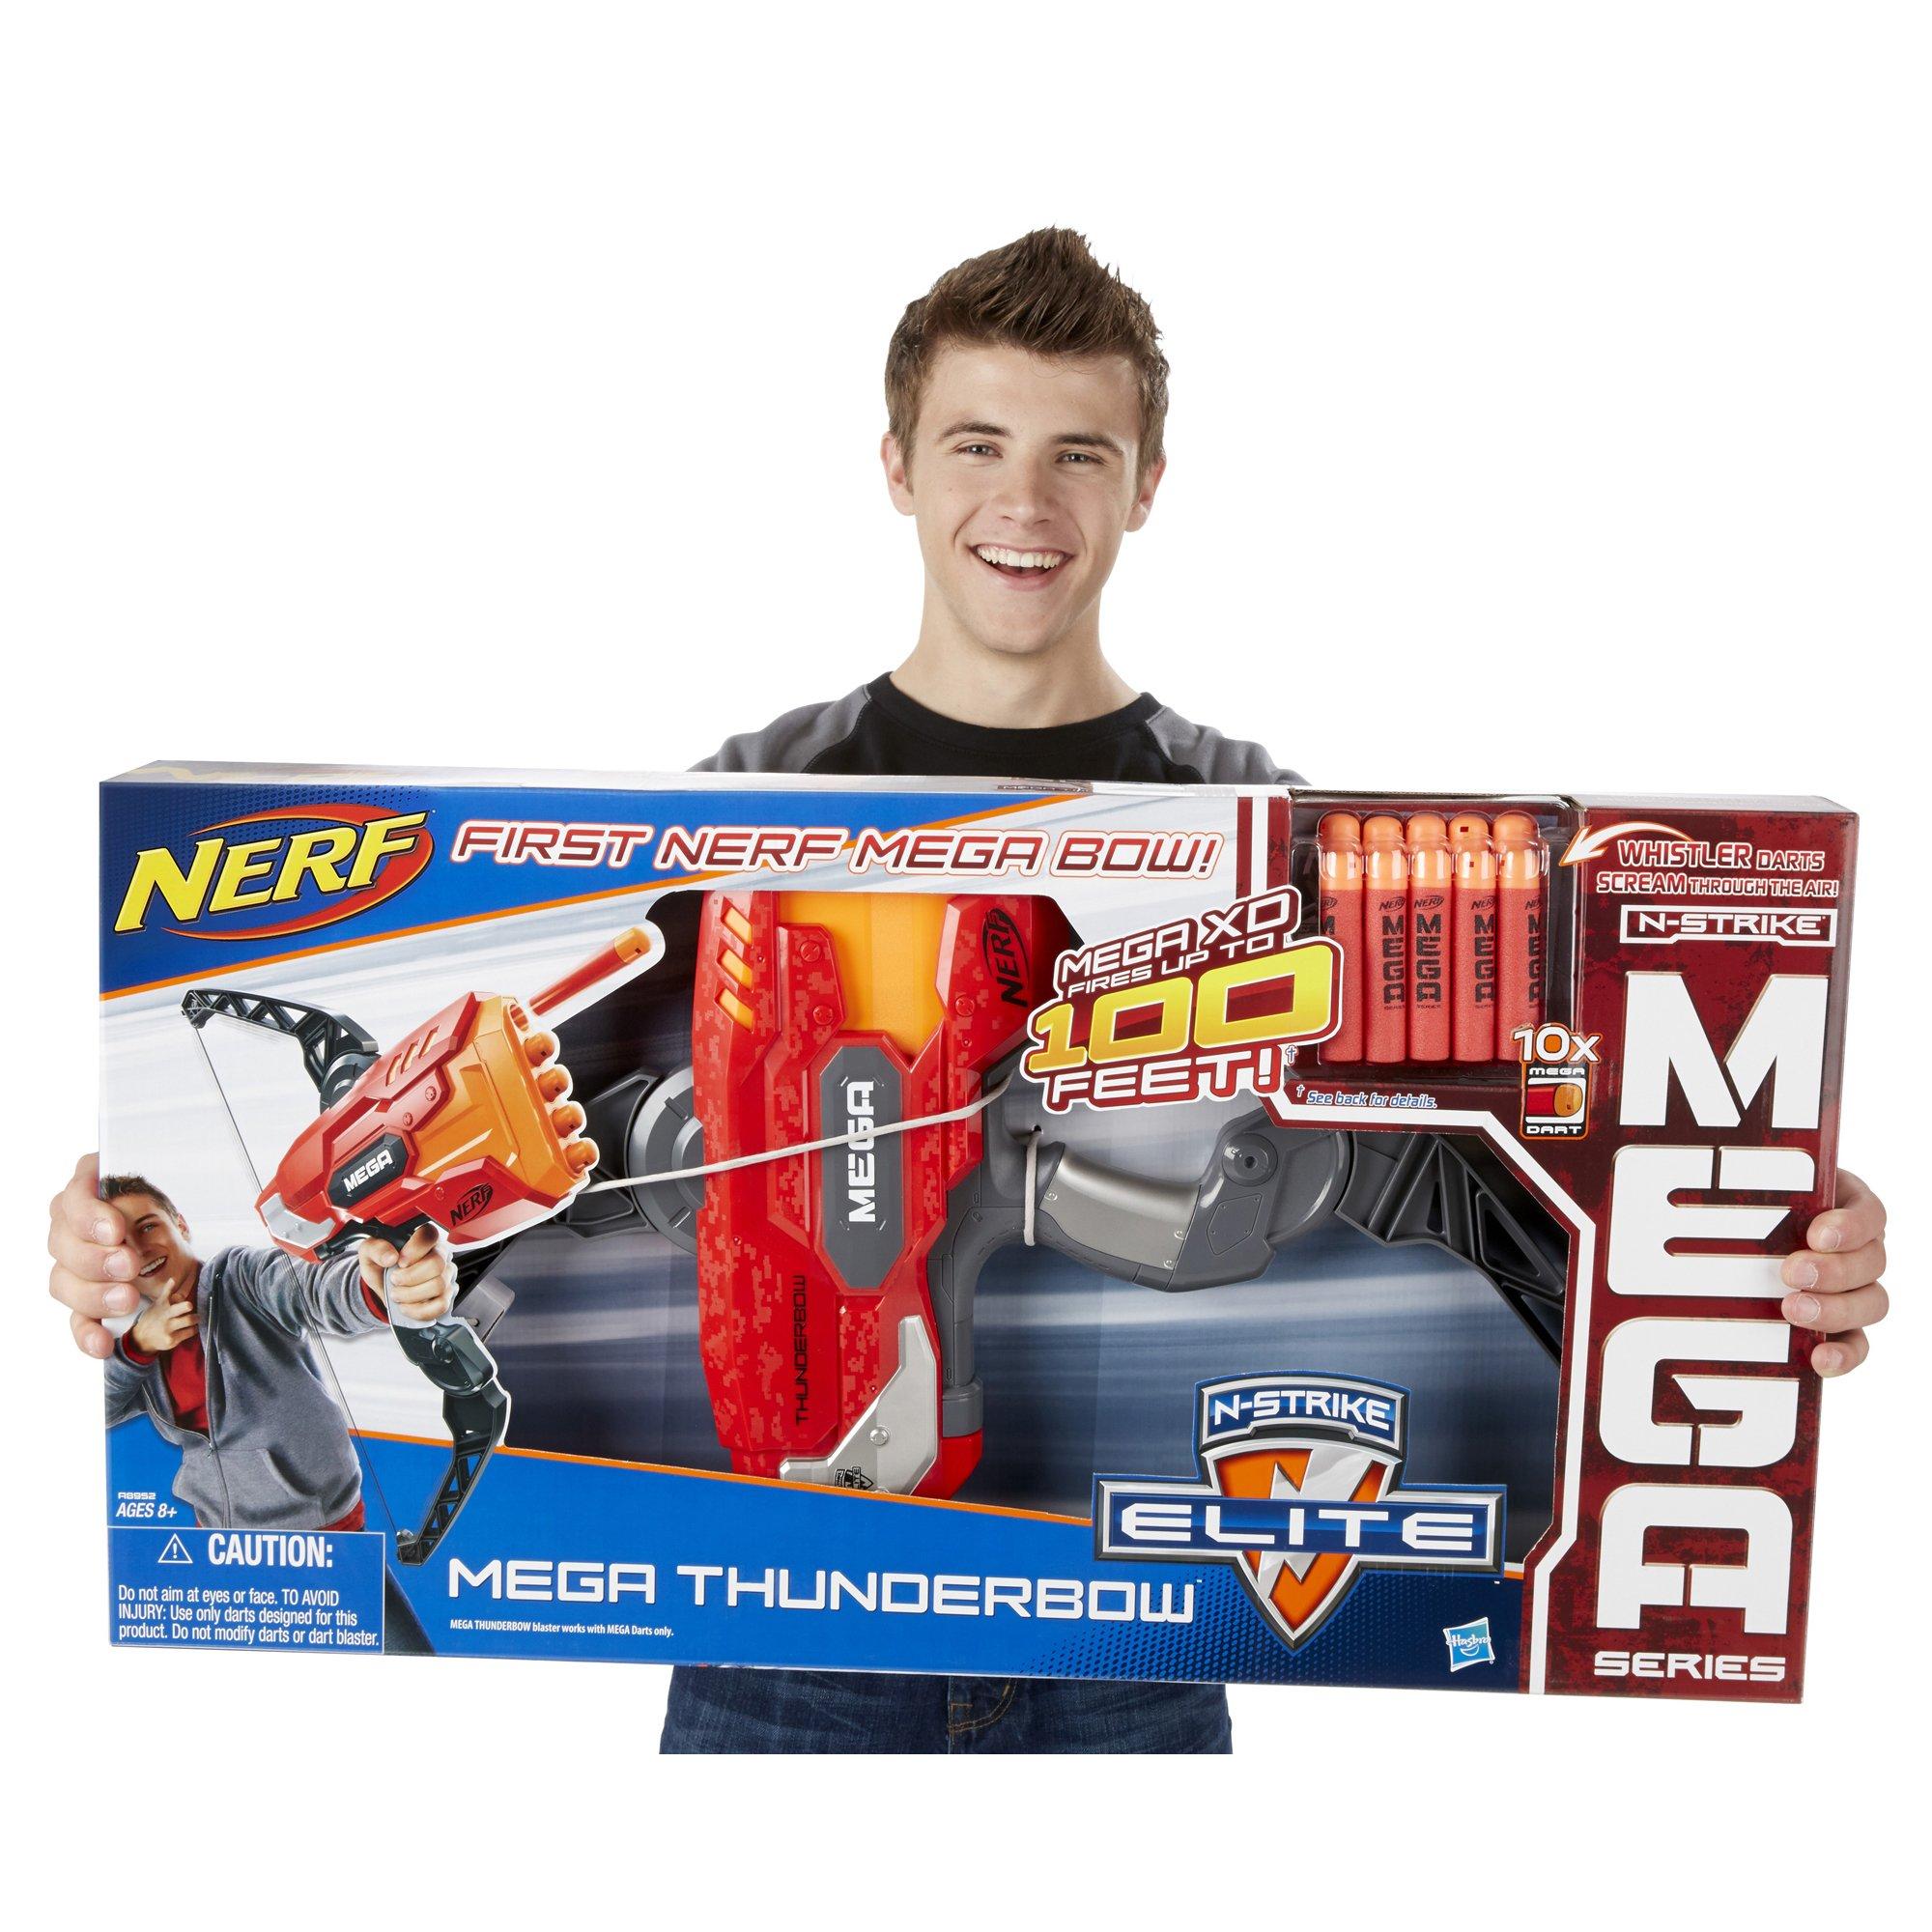 Nerf Mega ThunderBow Blaster by NERF (Image #6)